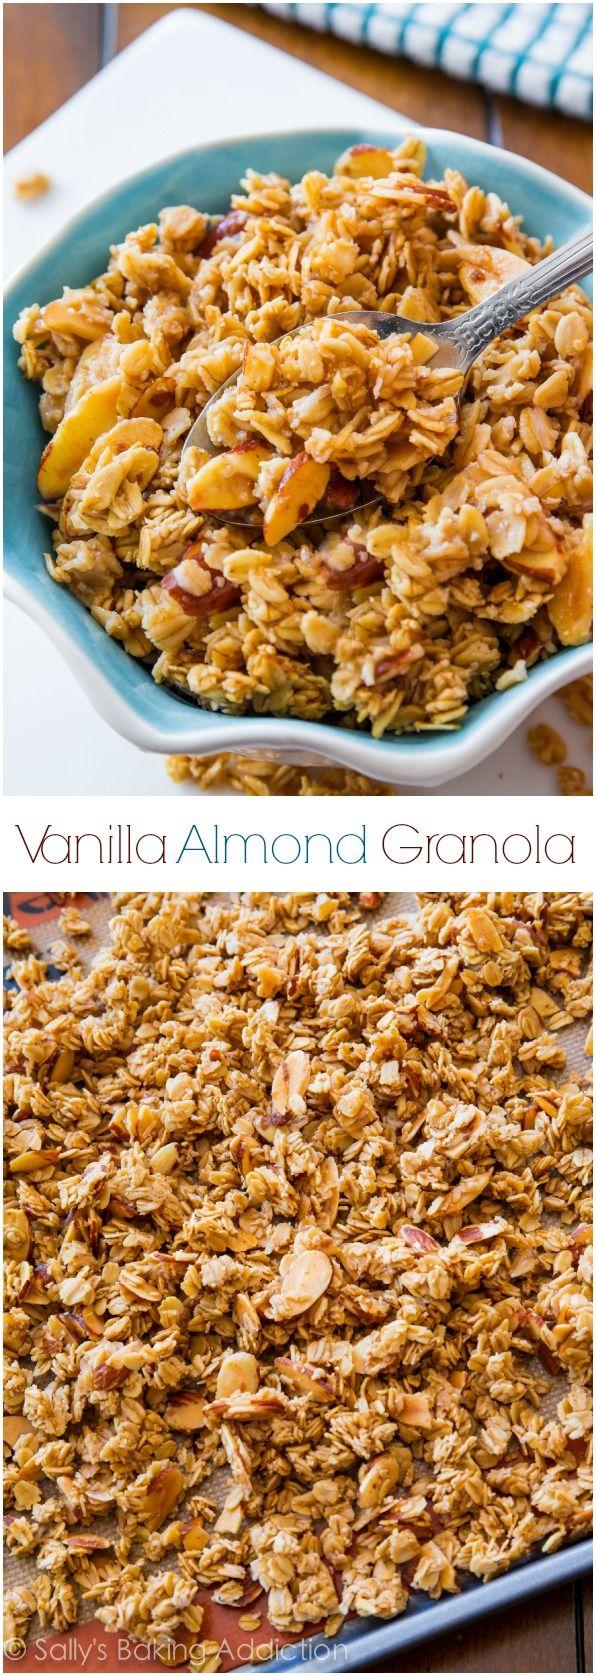 ... Homemade Granola, Homemade Granola Healthy, Homemade Granola Recipe